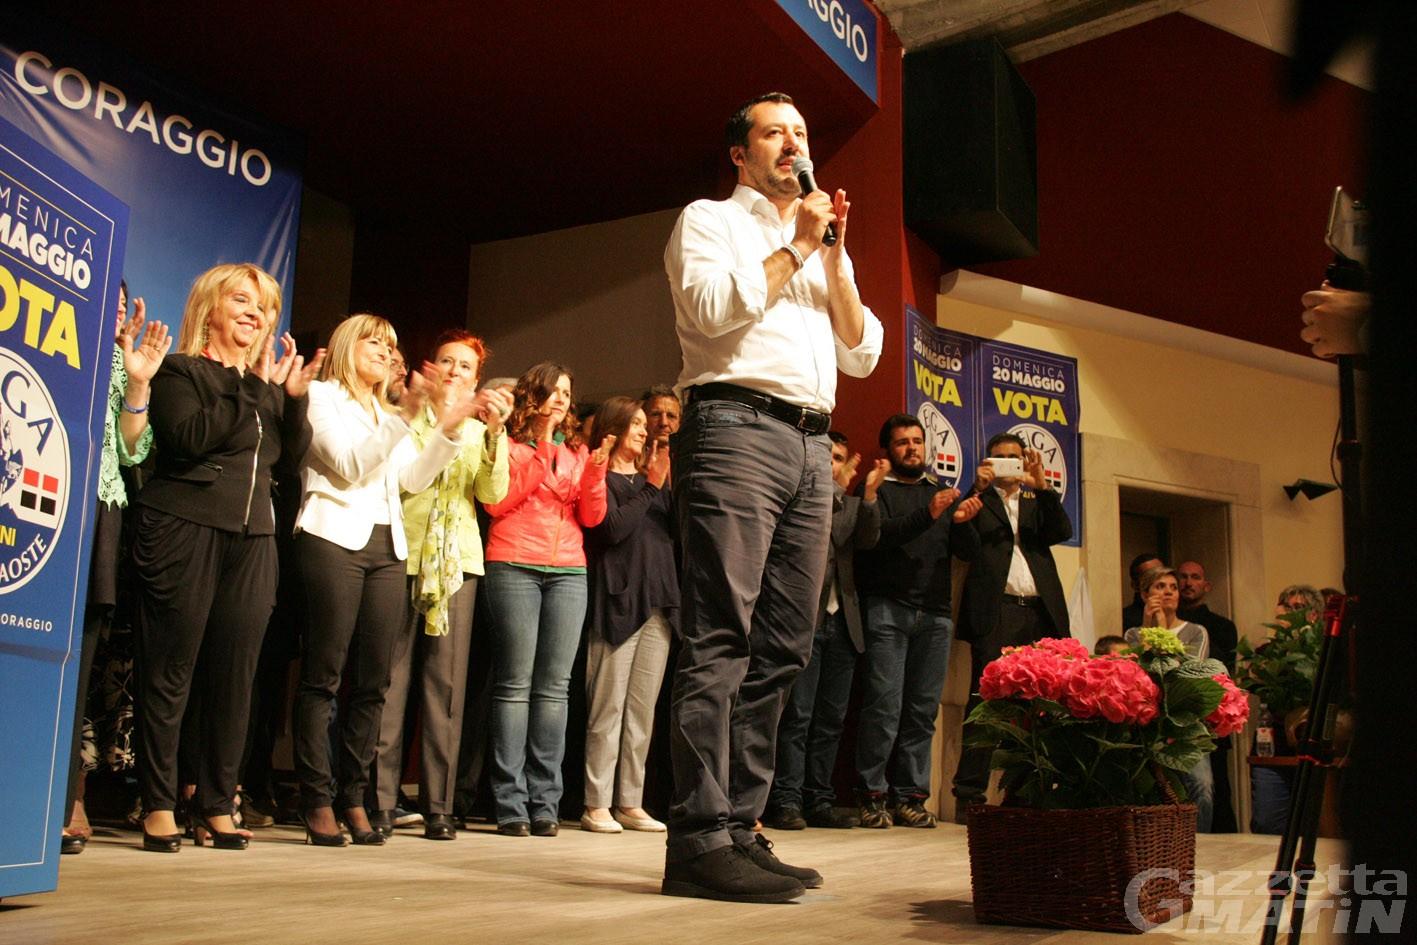 'Ndrangheta: Matteo Salvini venerdì 20 ad Aosta, Lega sconcertata dagli eventi